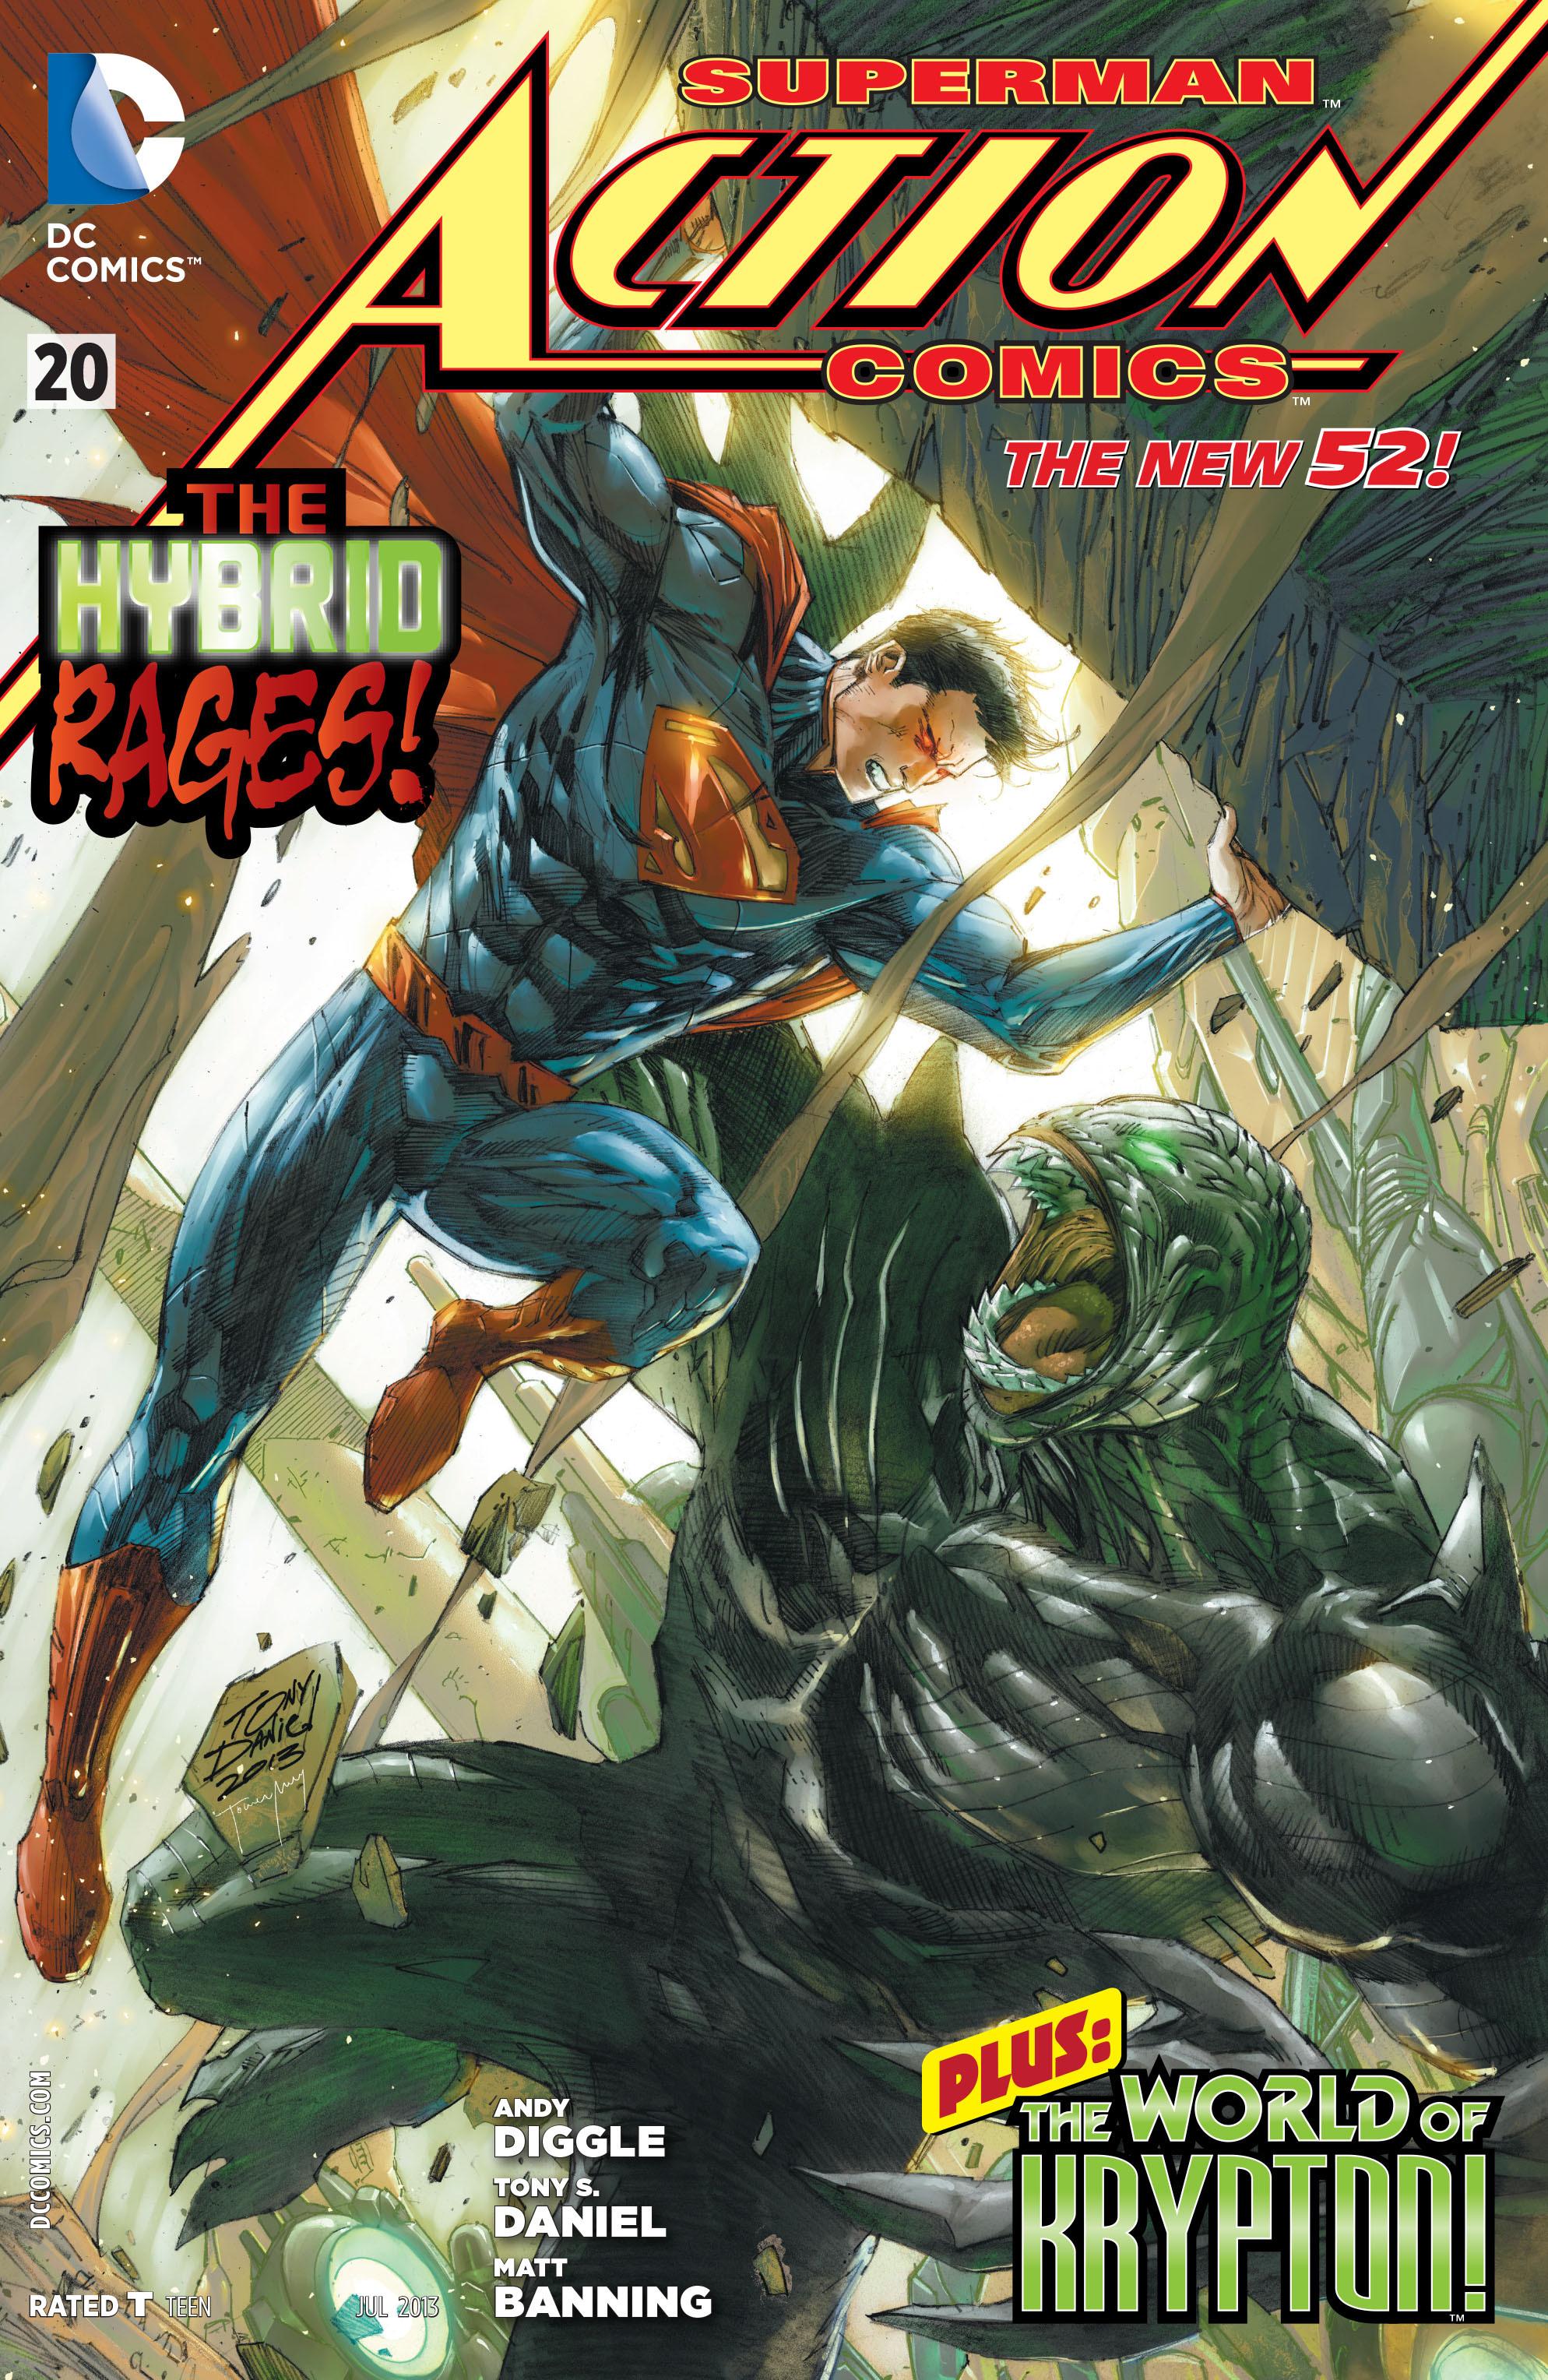 Action Comics (2011) 20 Page 1